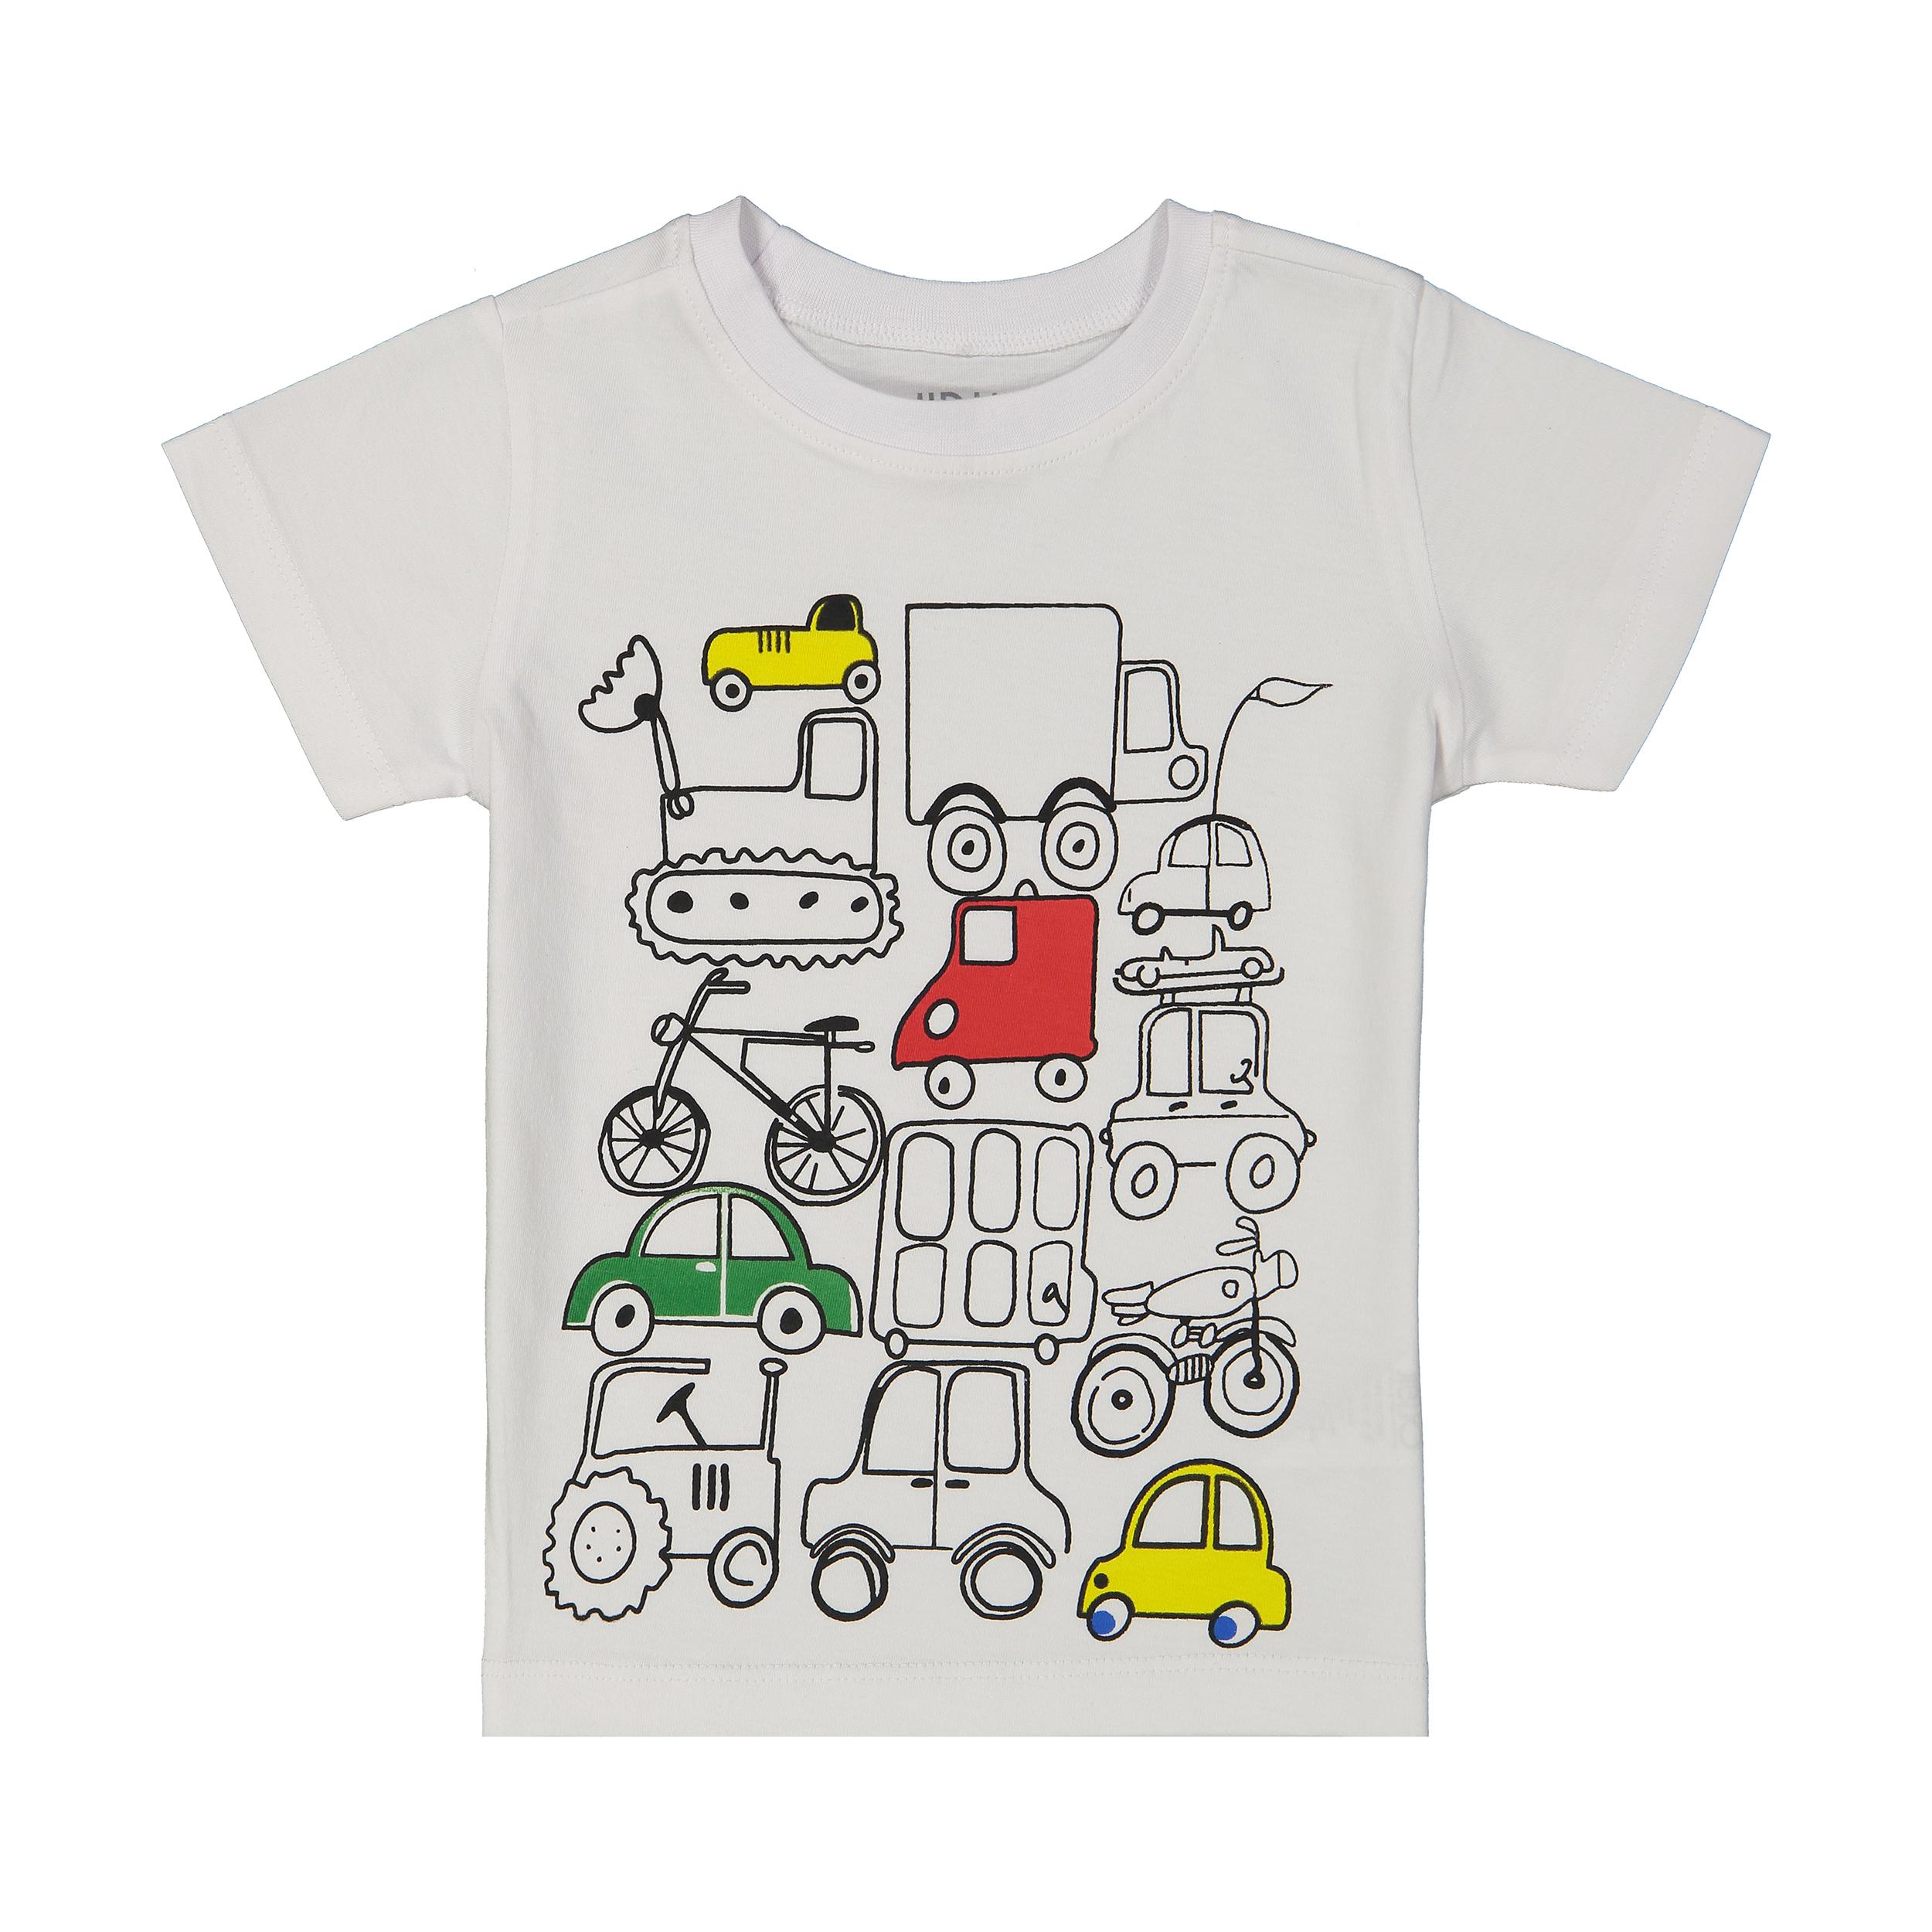 تی شرت پسرانه جیبیجو مدل 2081107-01